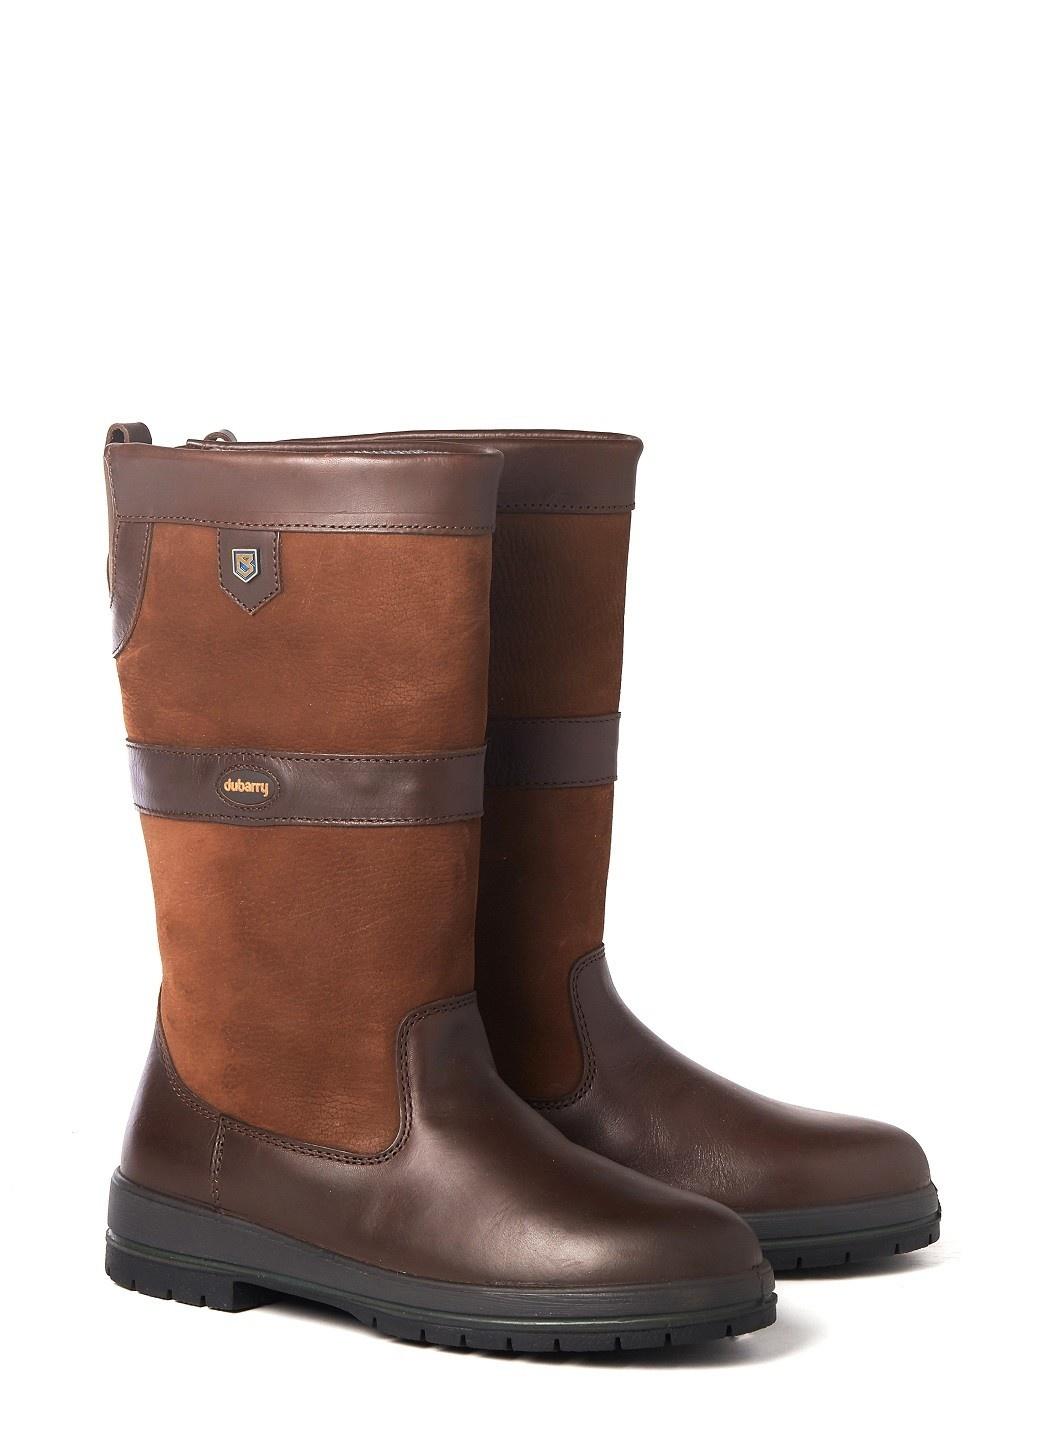 Dubarry Kildare outdoor laarzen - Walnut-3